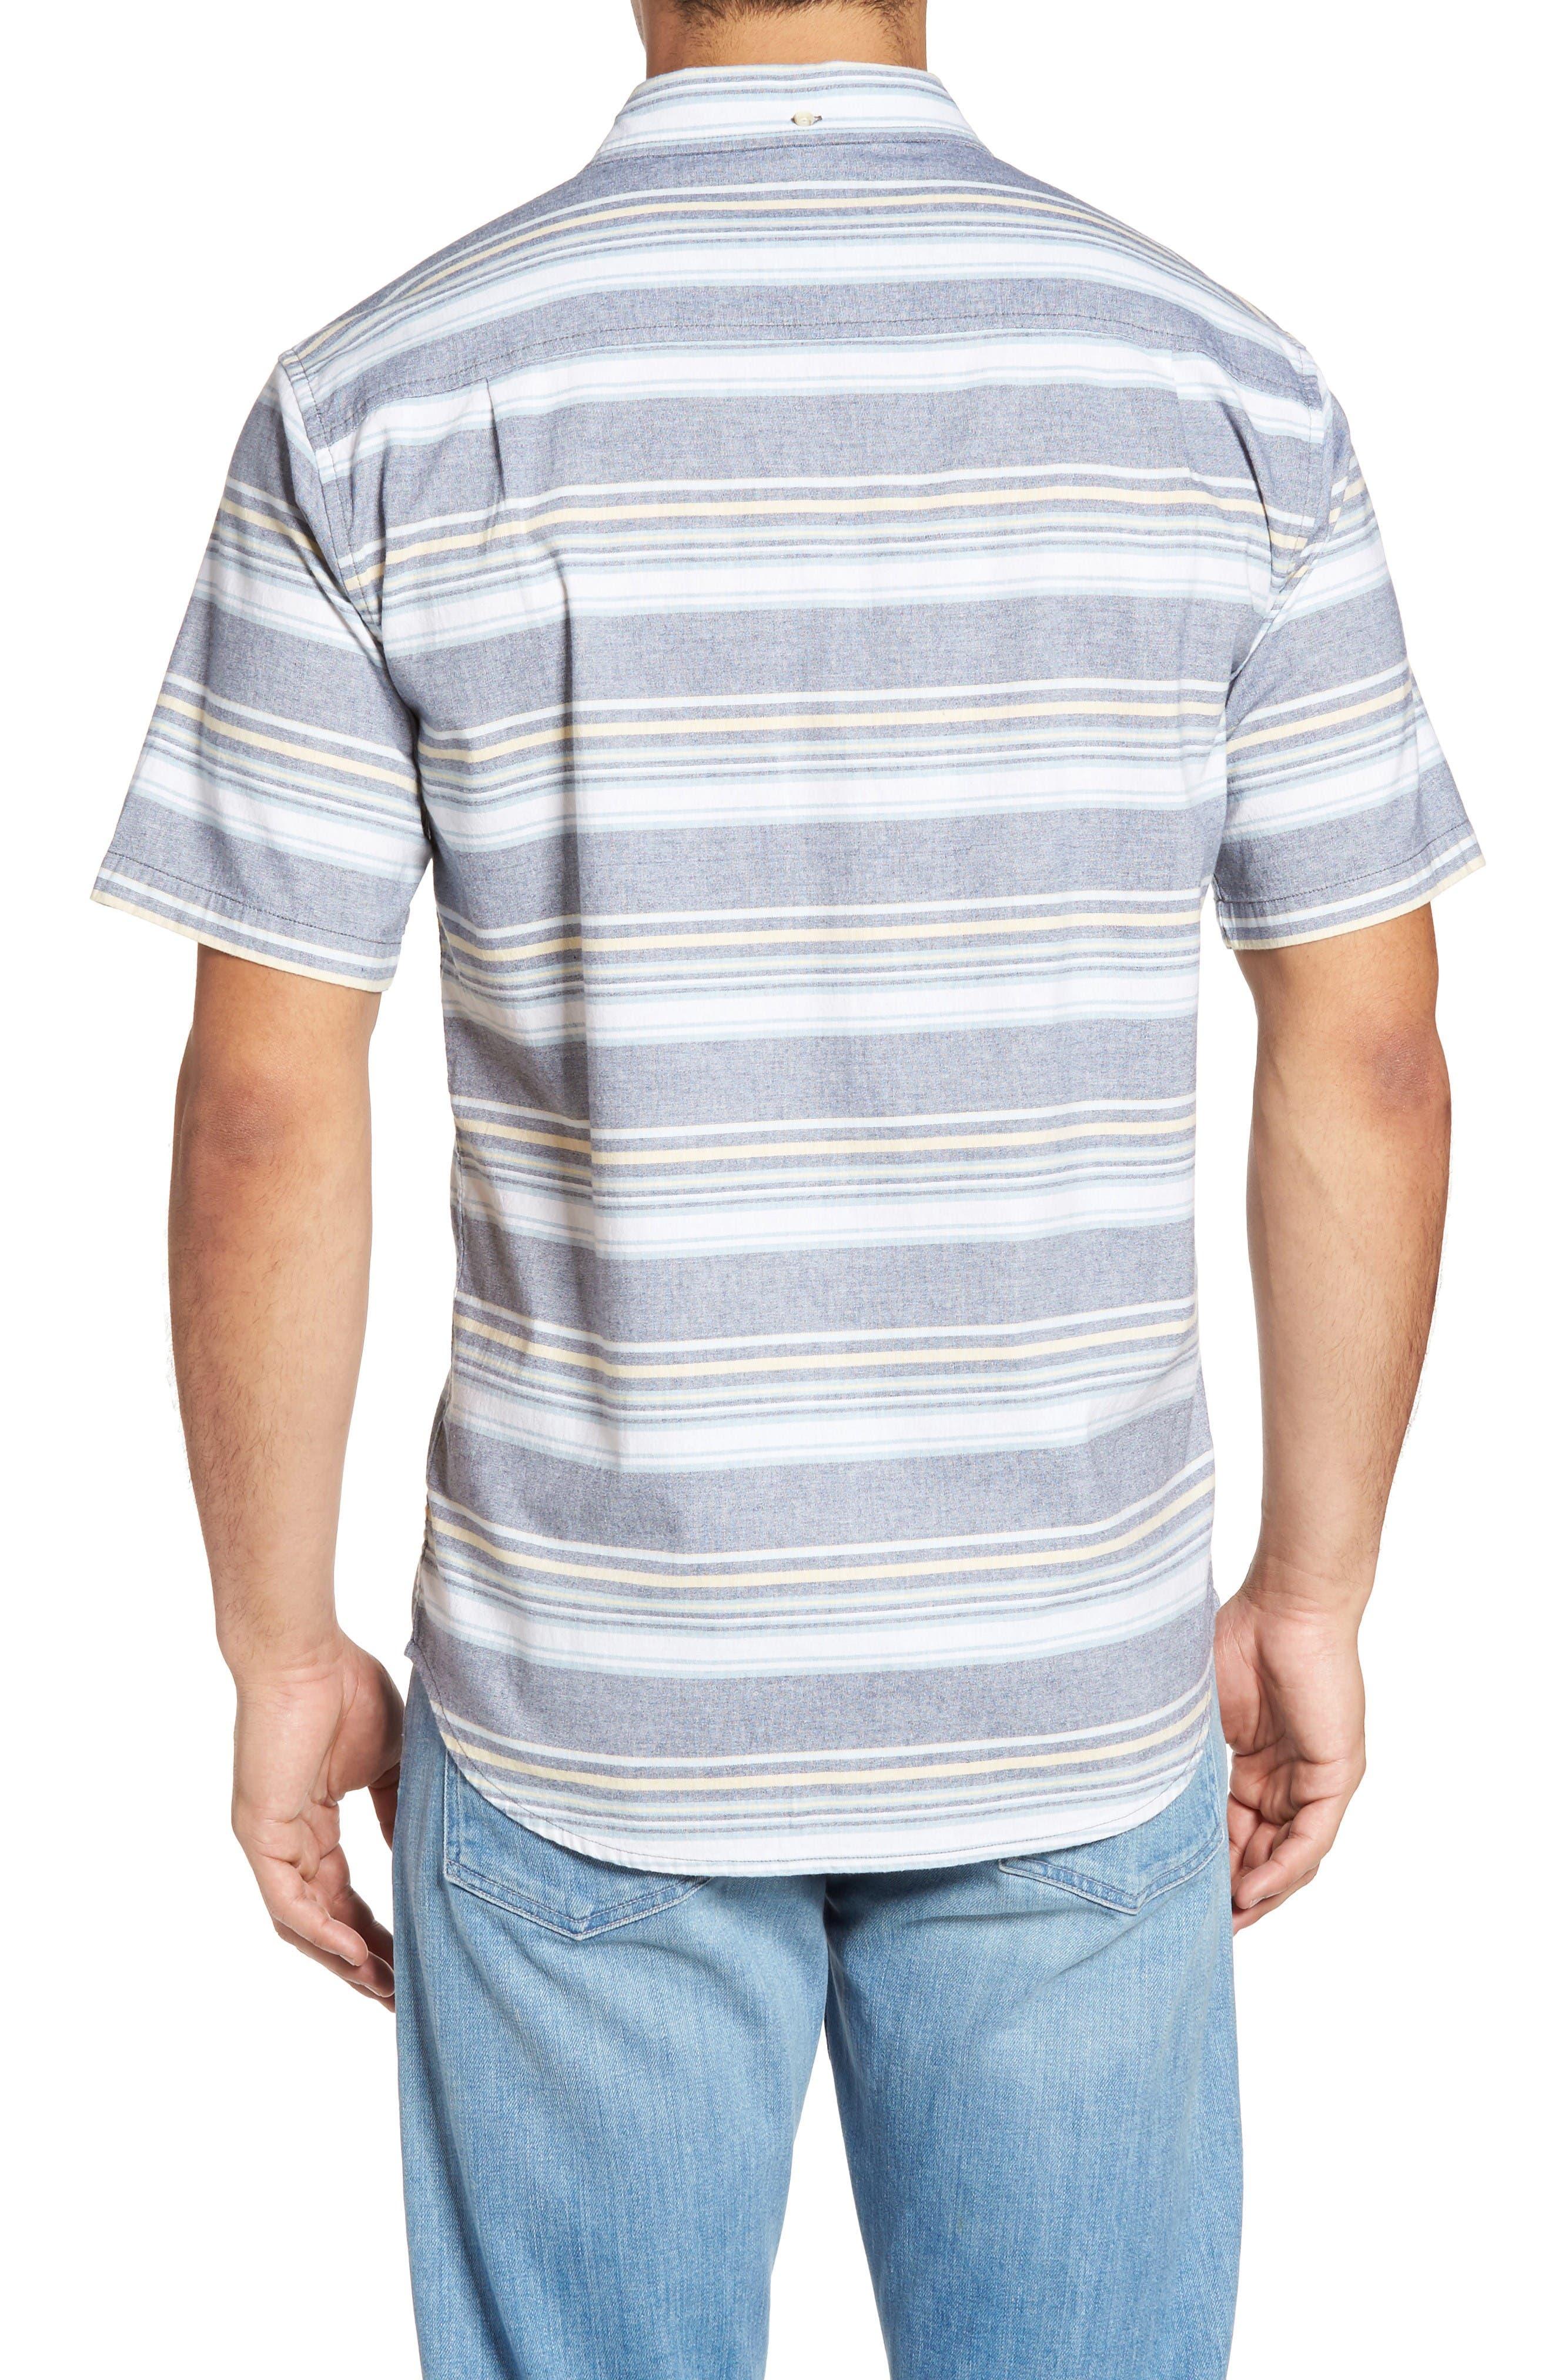 Pura Vida Sport Shirt,                             Alternate thumbnail 2, color,                             Navy